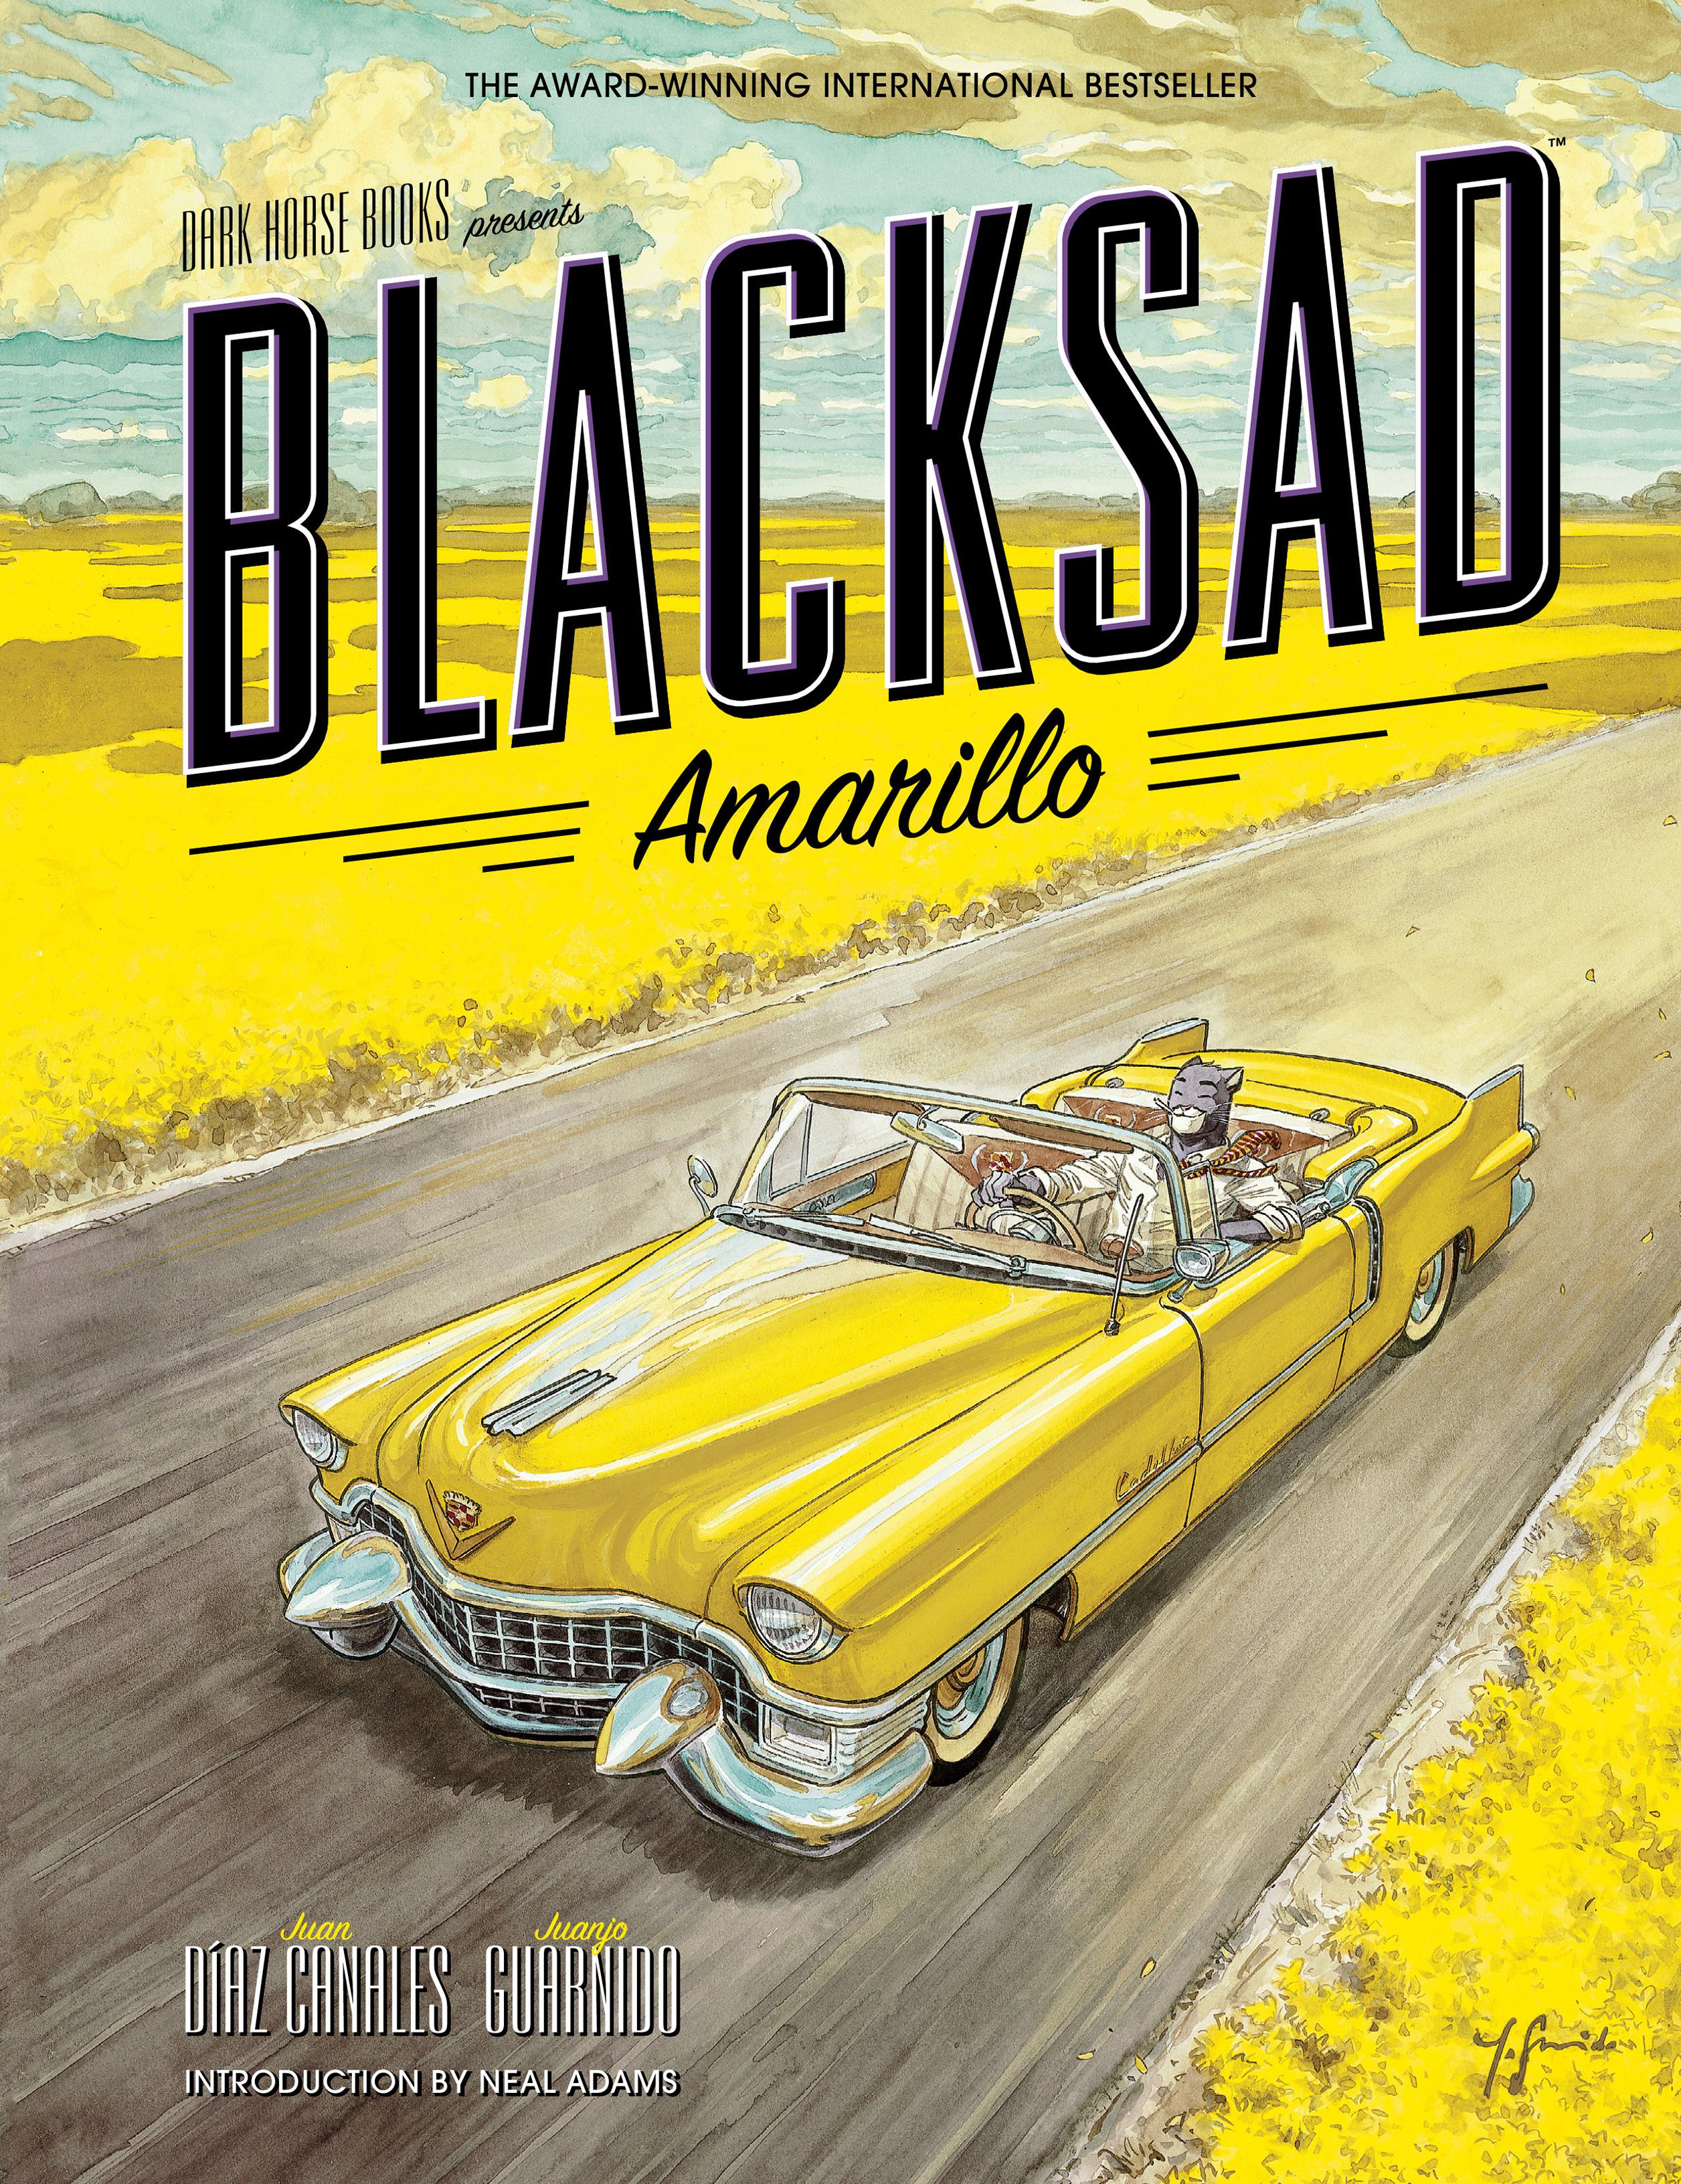 Read online Blacksad: Amarillo comic -  Issue # Full - 1